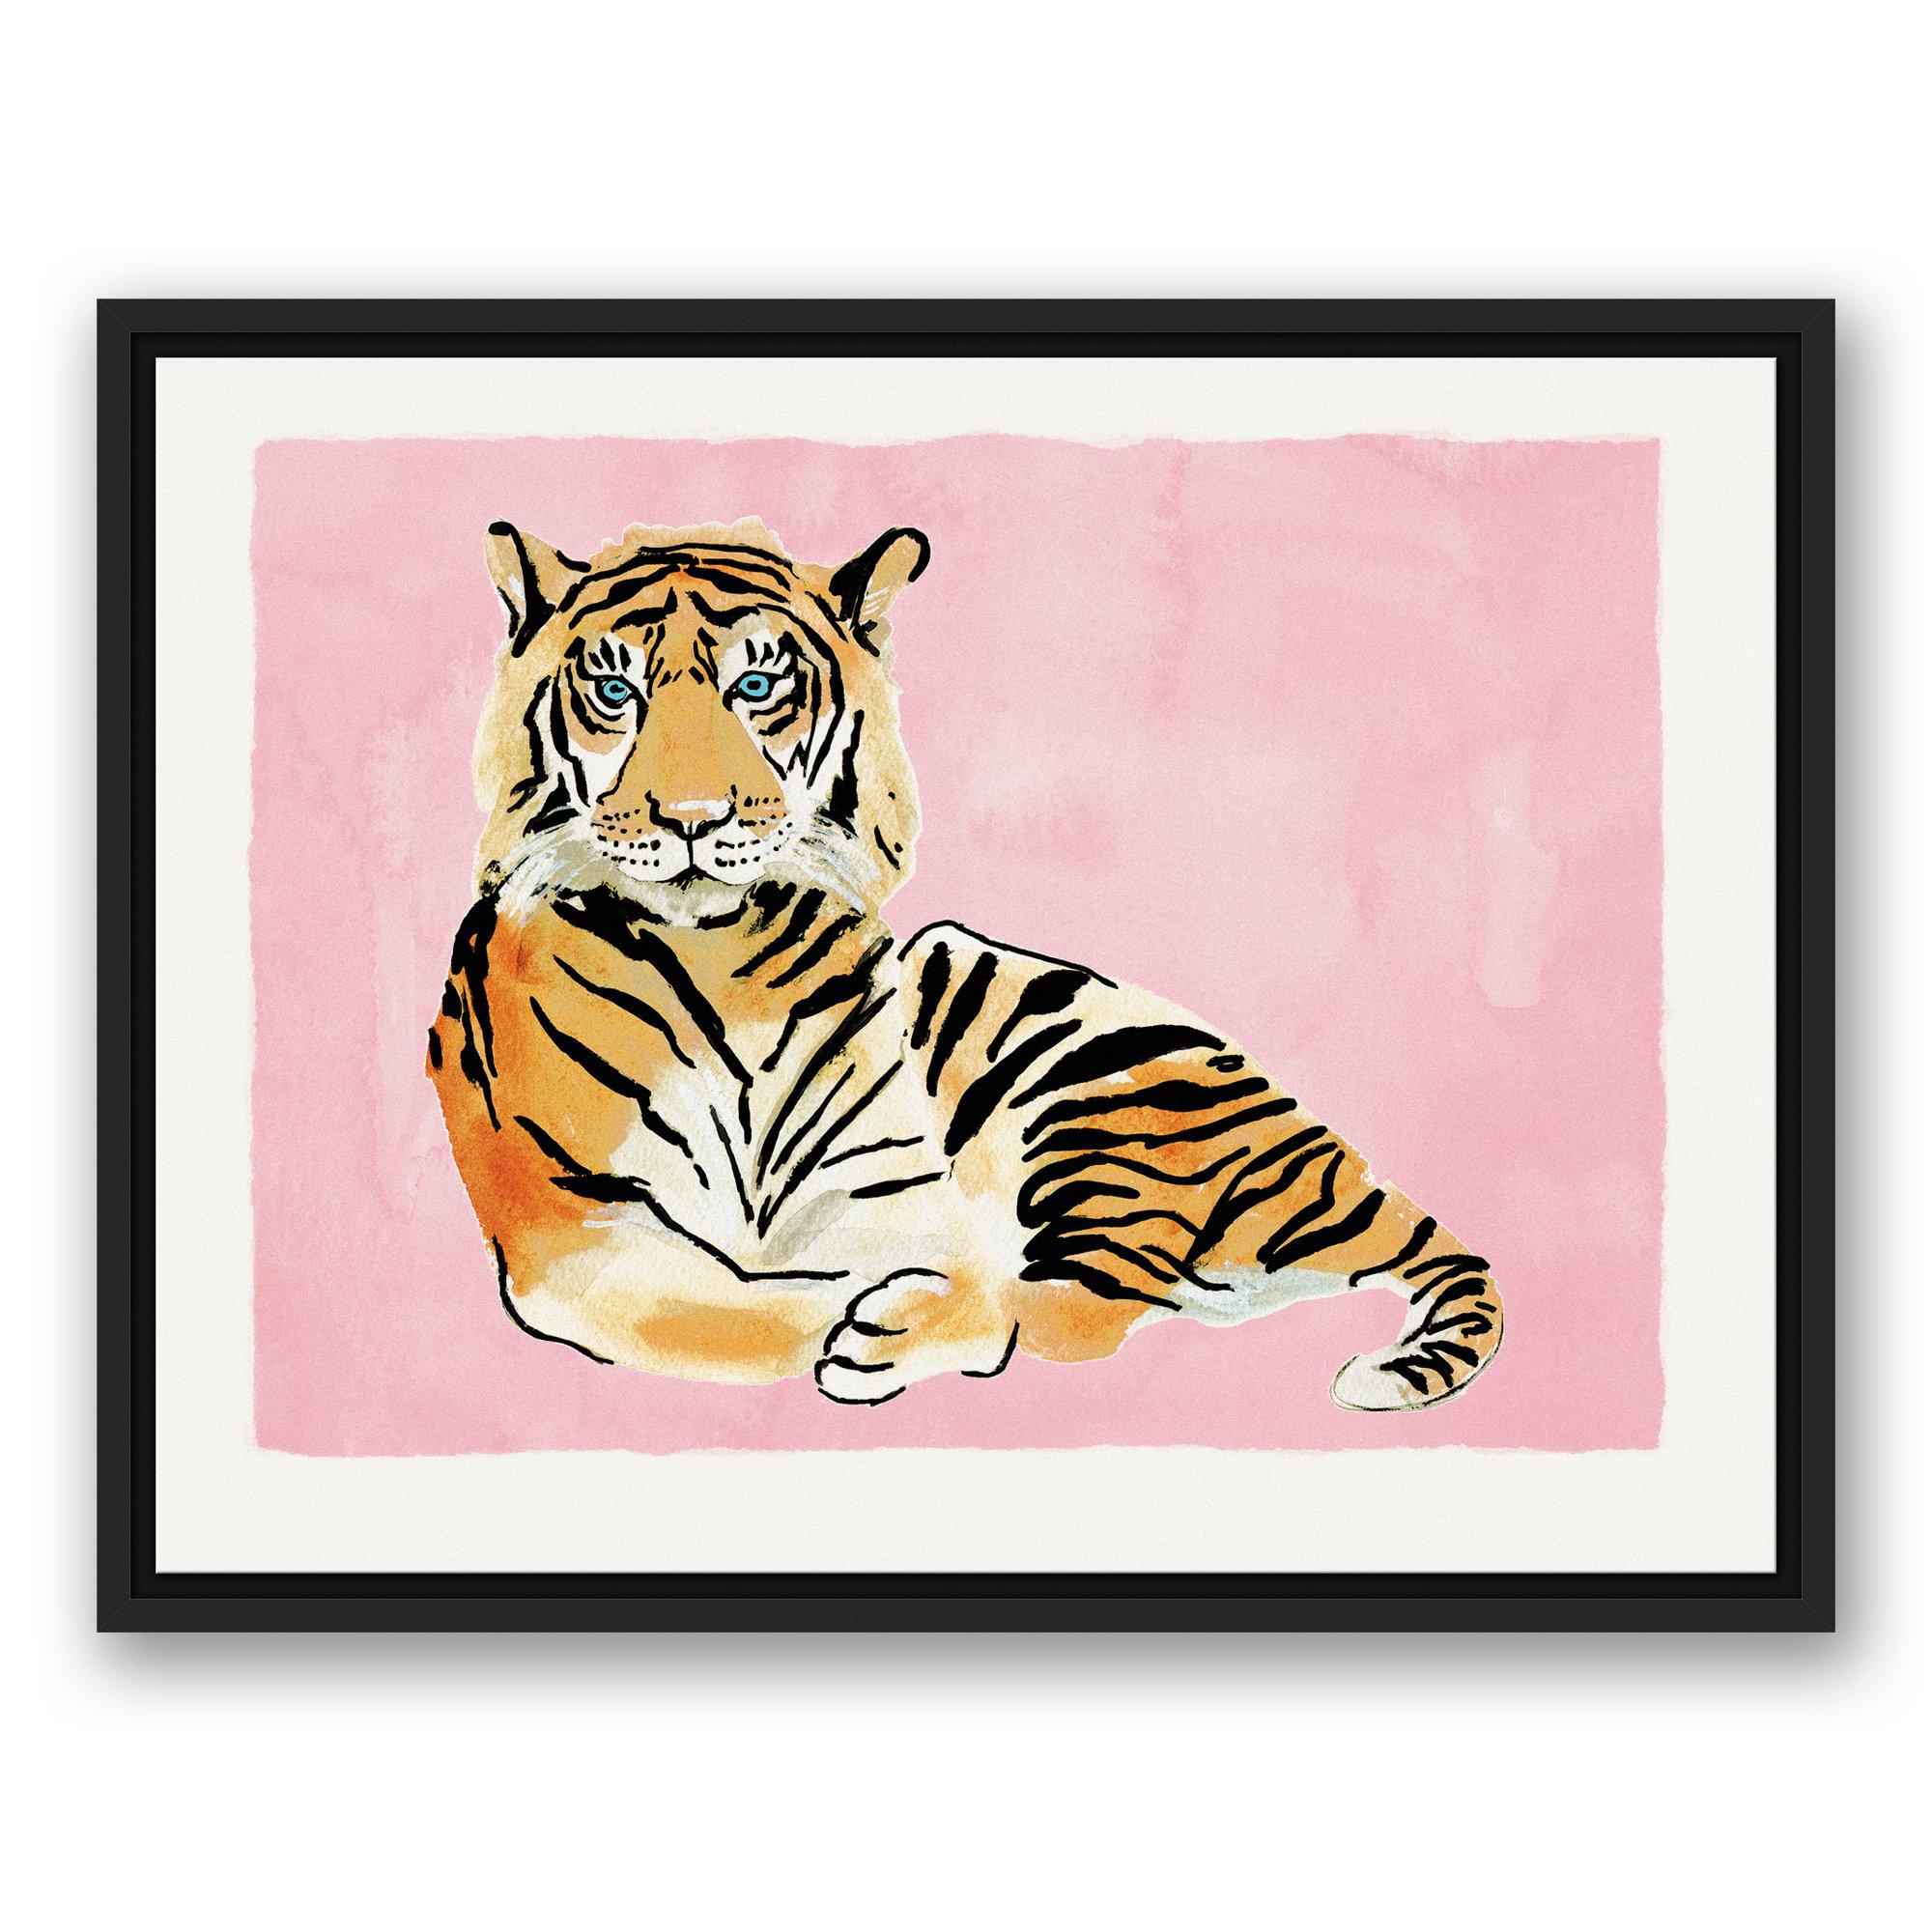 Watercolor laundry linen clipart image transparent download \'Tiger on Pink Background\' Framed Watercolor Painting Print on Canvas image transparent download